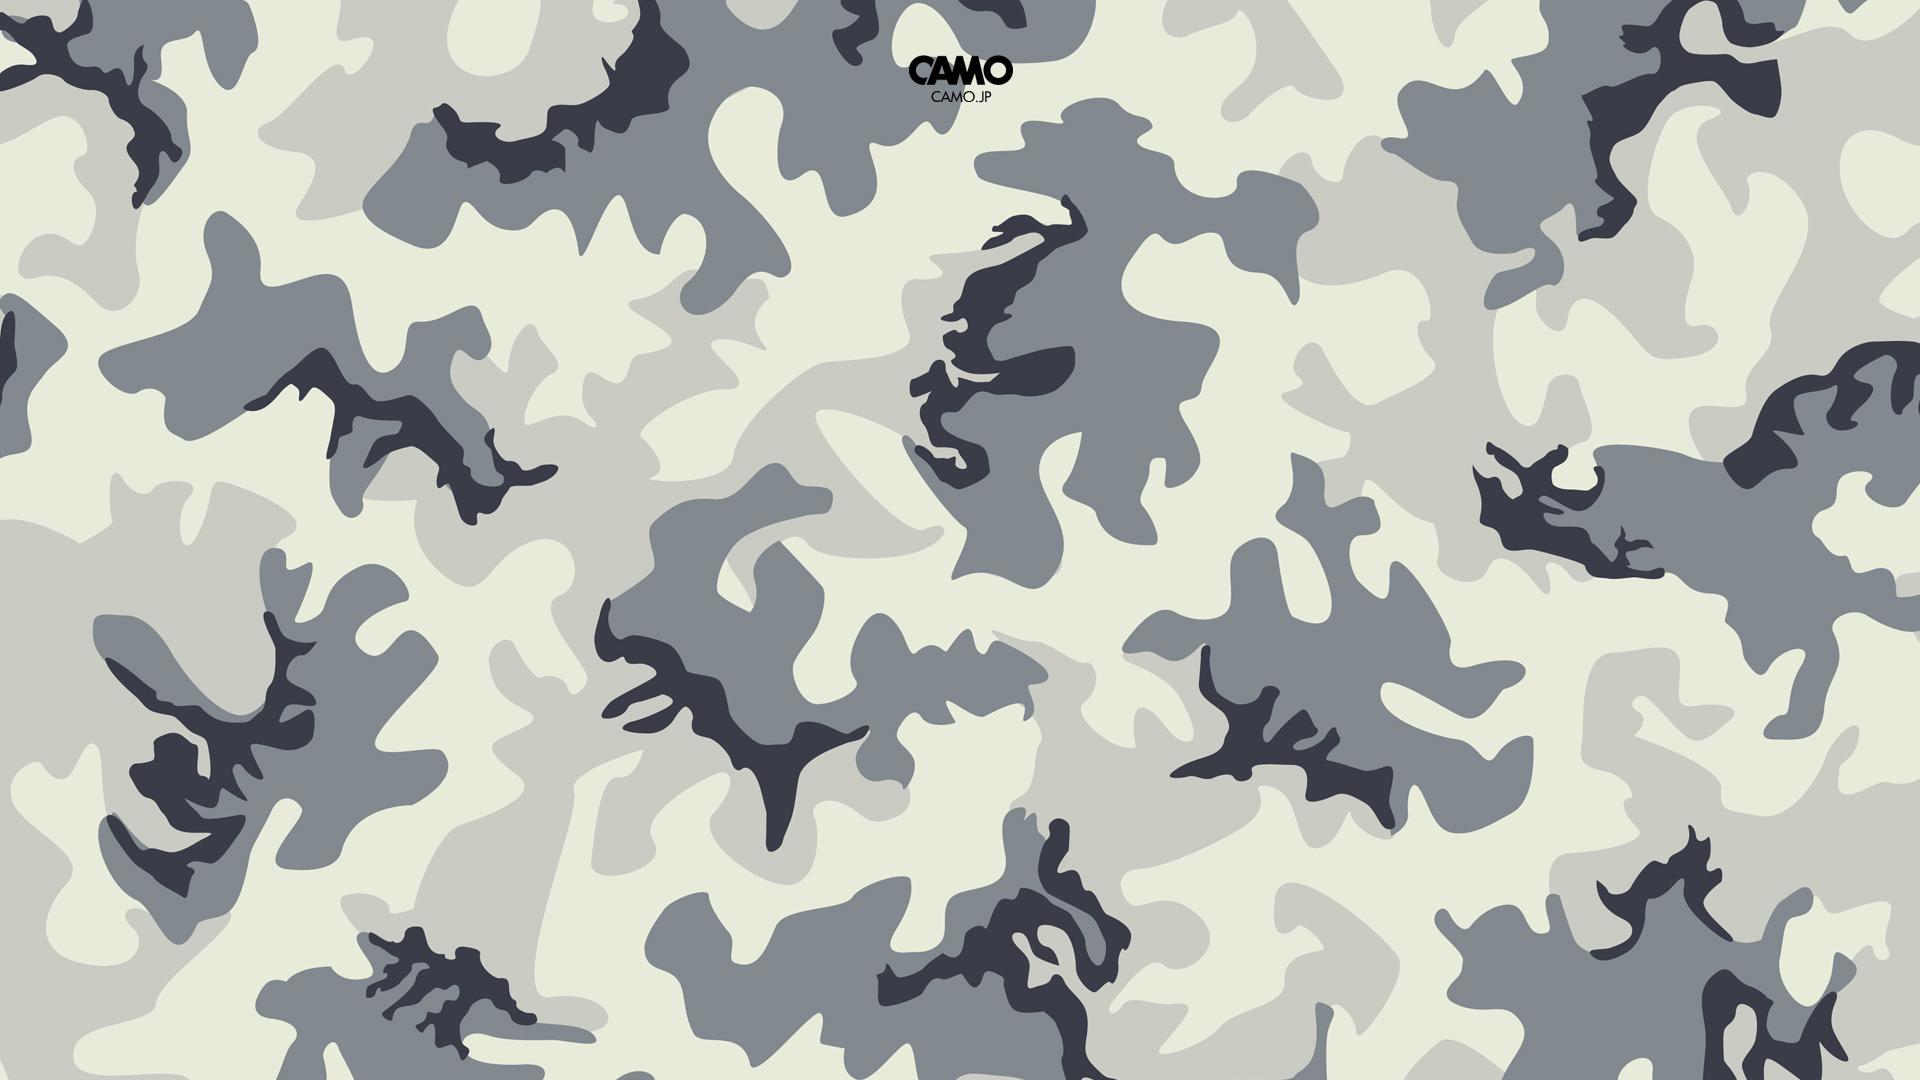 Bape Camo Iphone Wallpaper Wallpapersafari